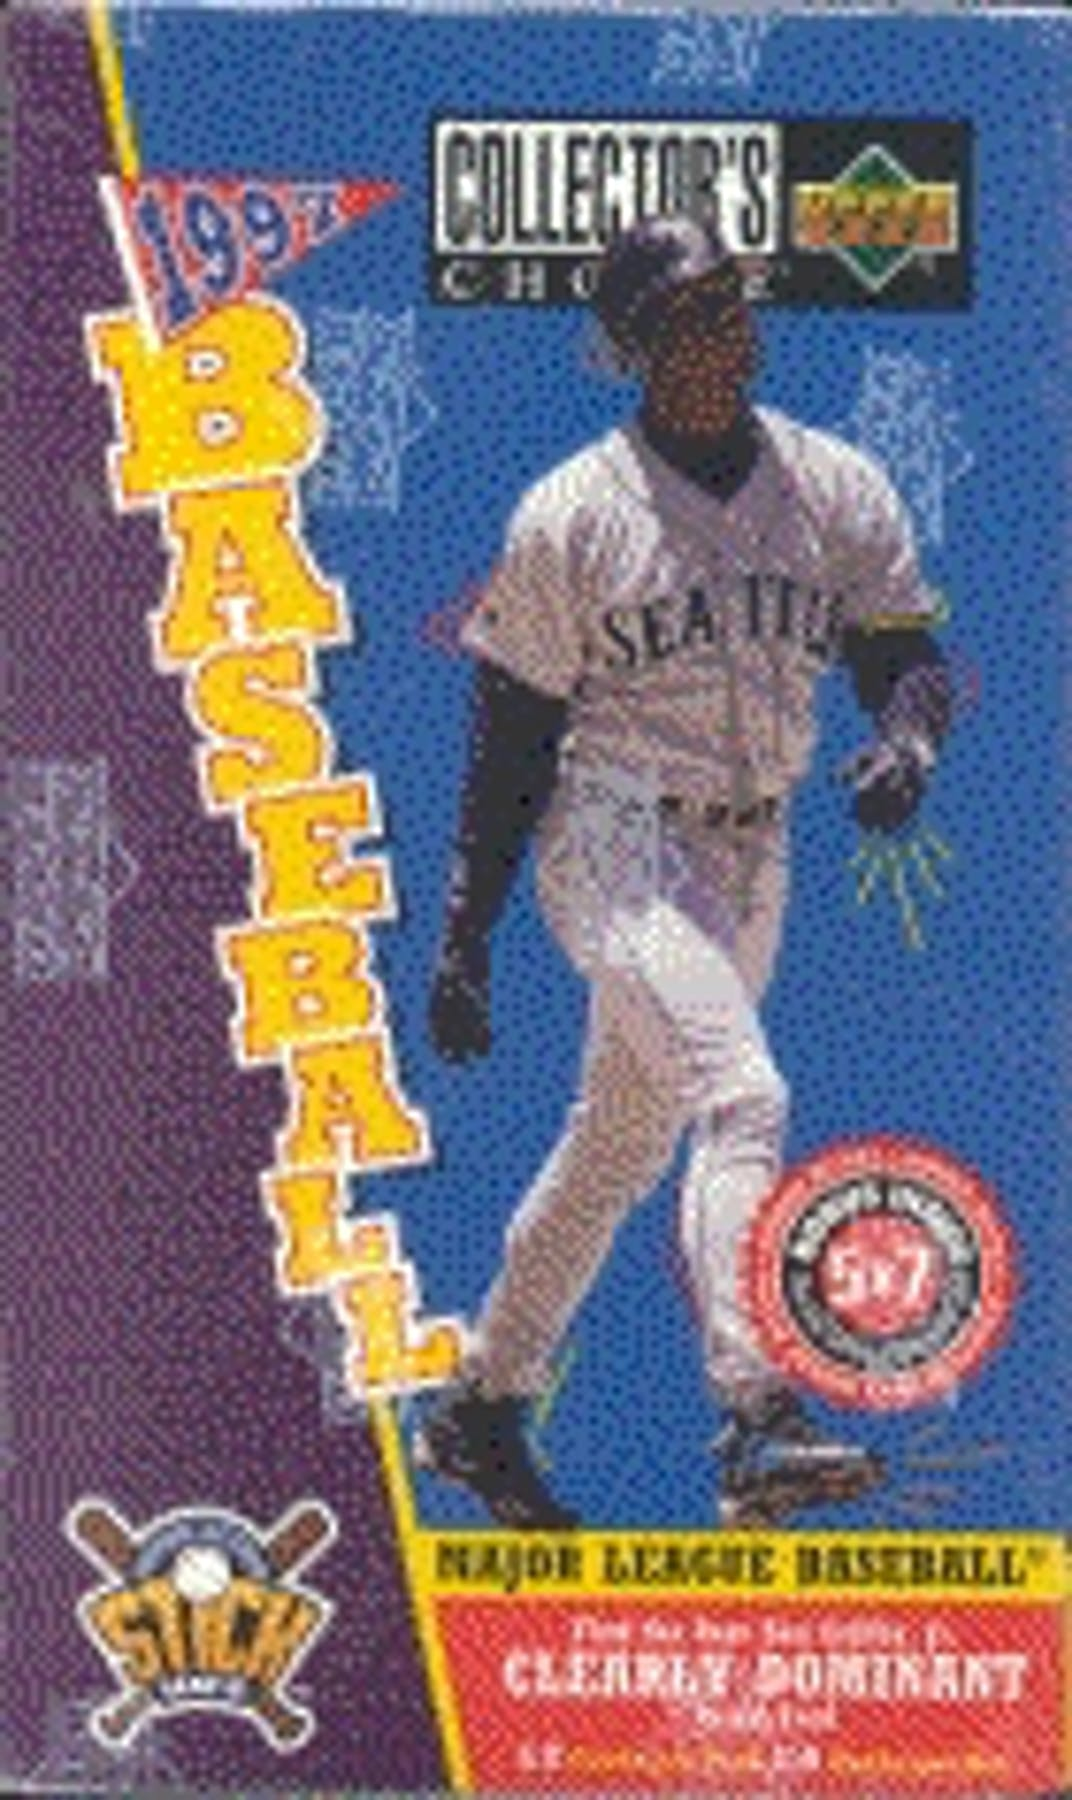 1997 Upper Deck Collectors Choice Series 1 Baseball Hobby Box Da